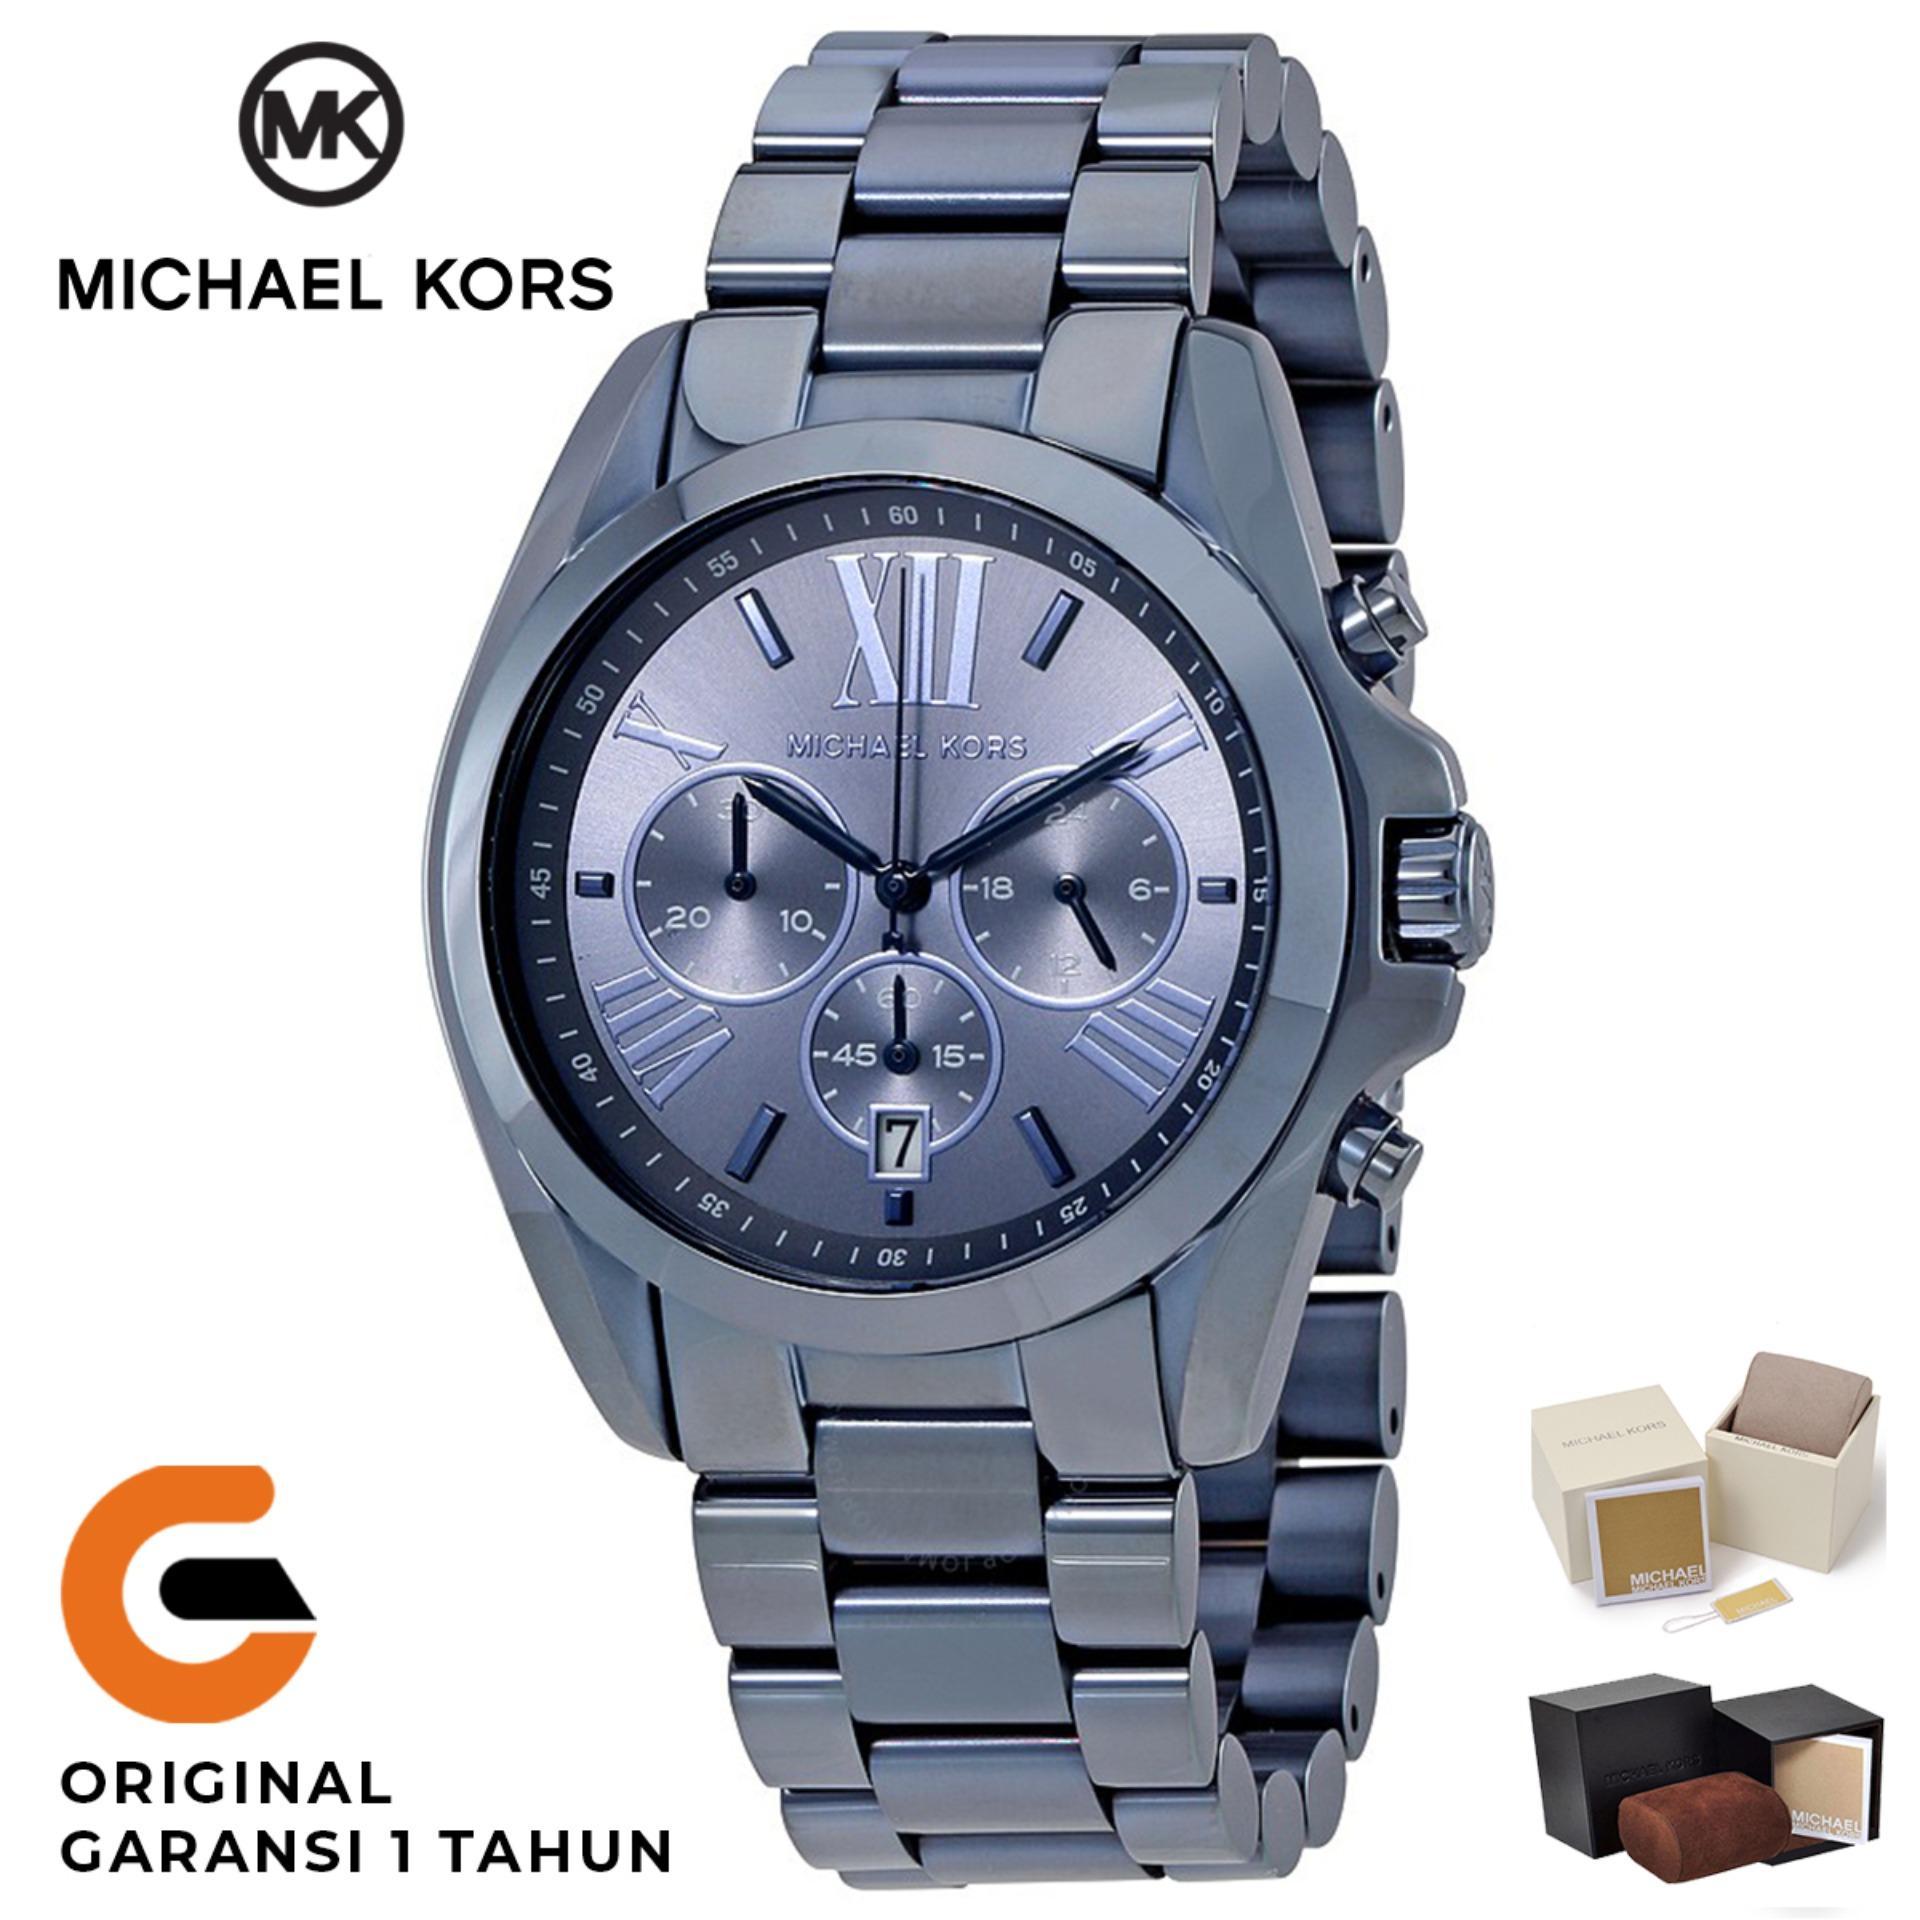 Michael Kors Watch Original Jam Tangan Wanita Michael Kors Bradshaw MK6248  Tali Rantai Stainless Strap Blue 5b8bdfb077